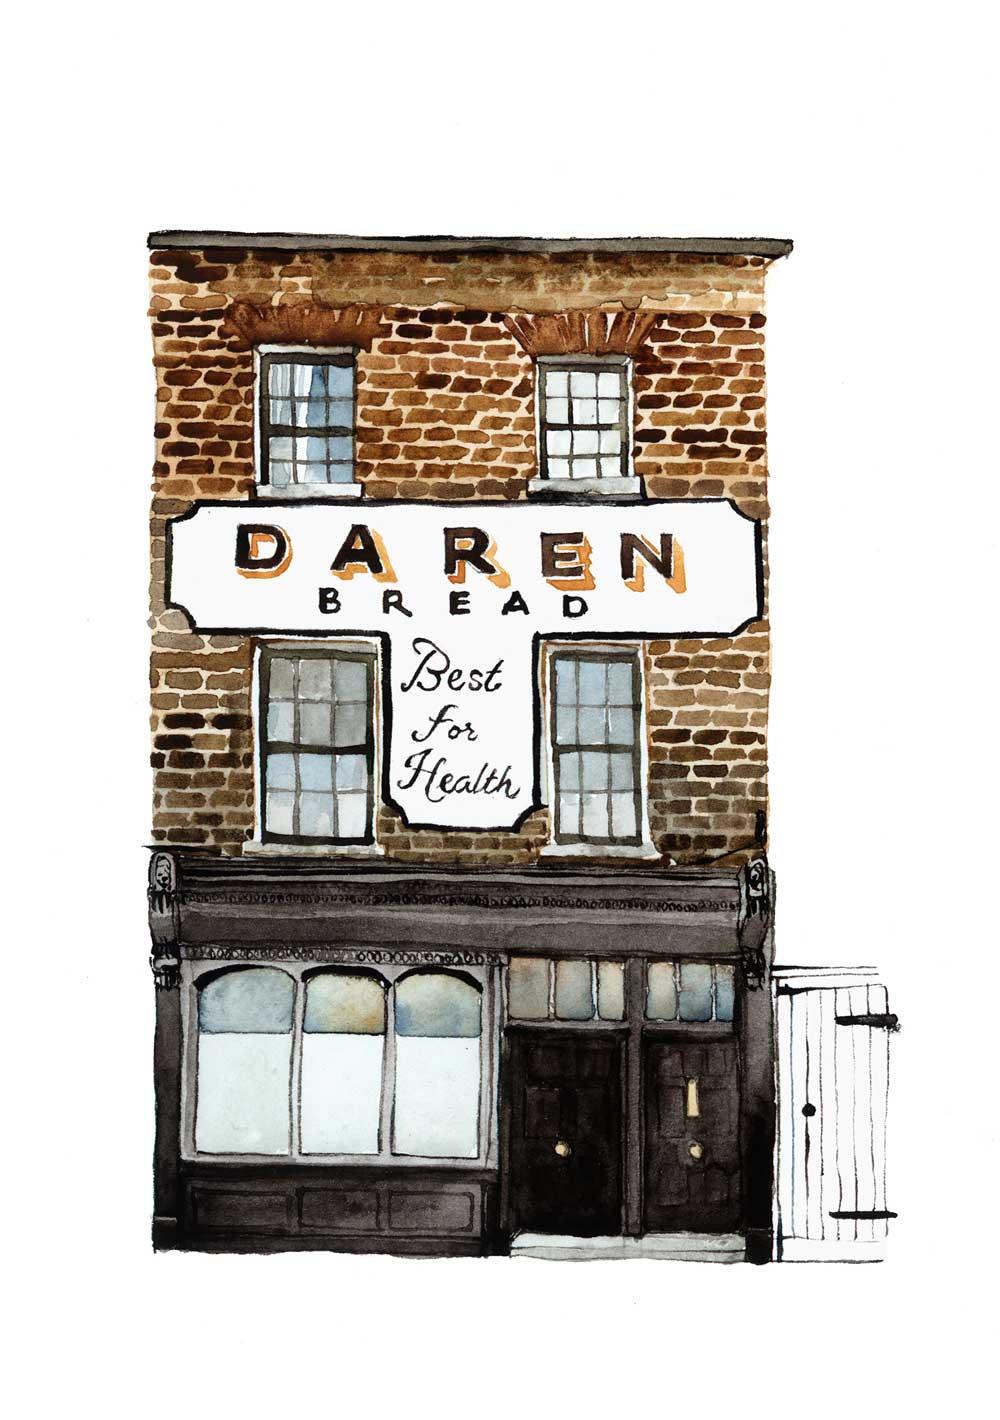 Daren-Bread-Stepney-Green-1000px.jpg